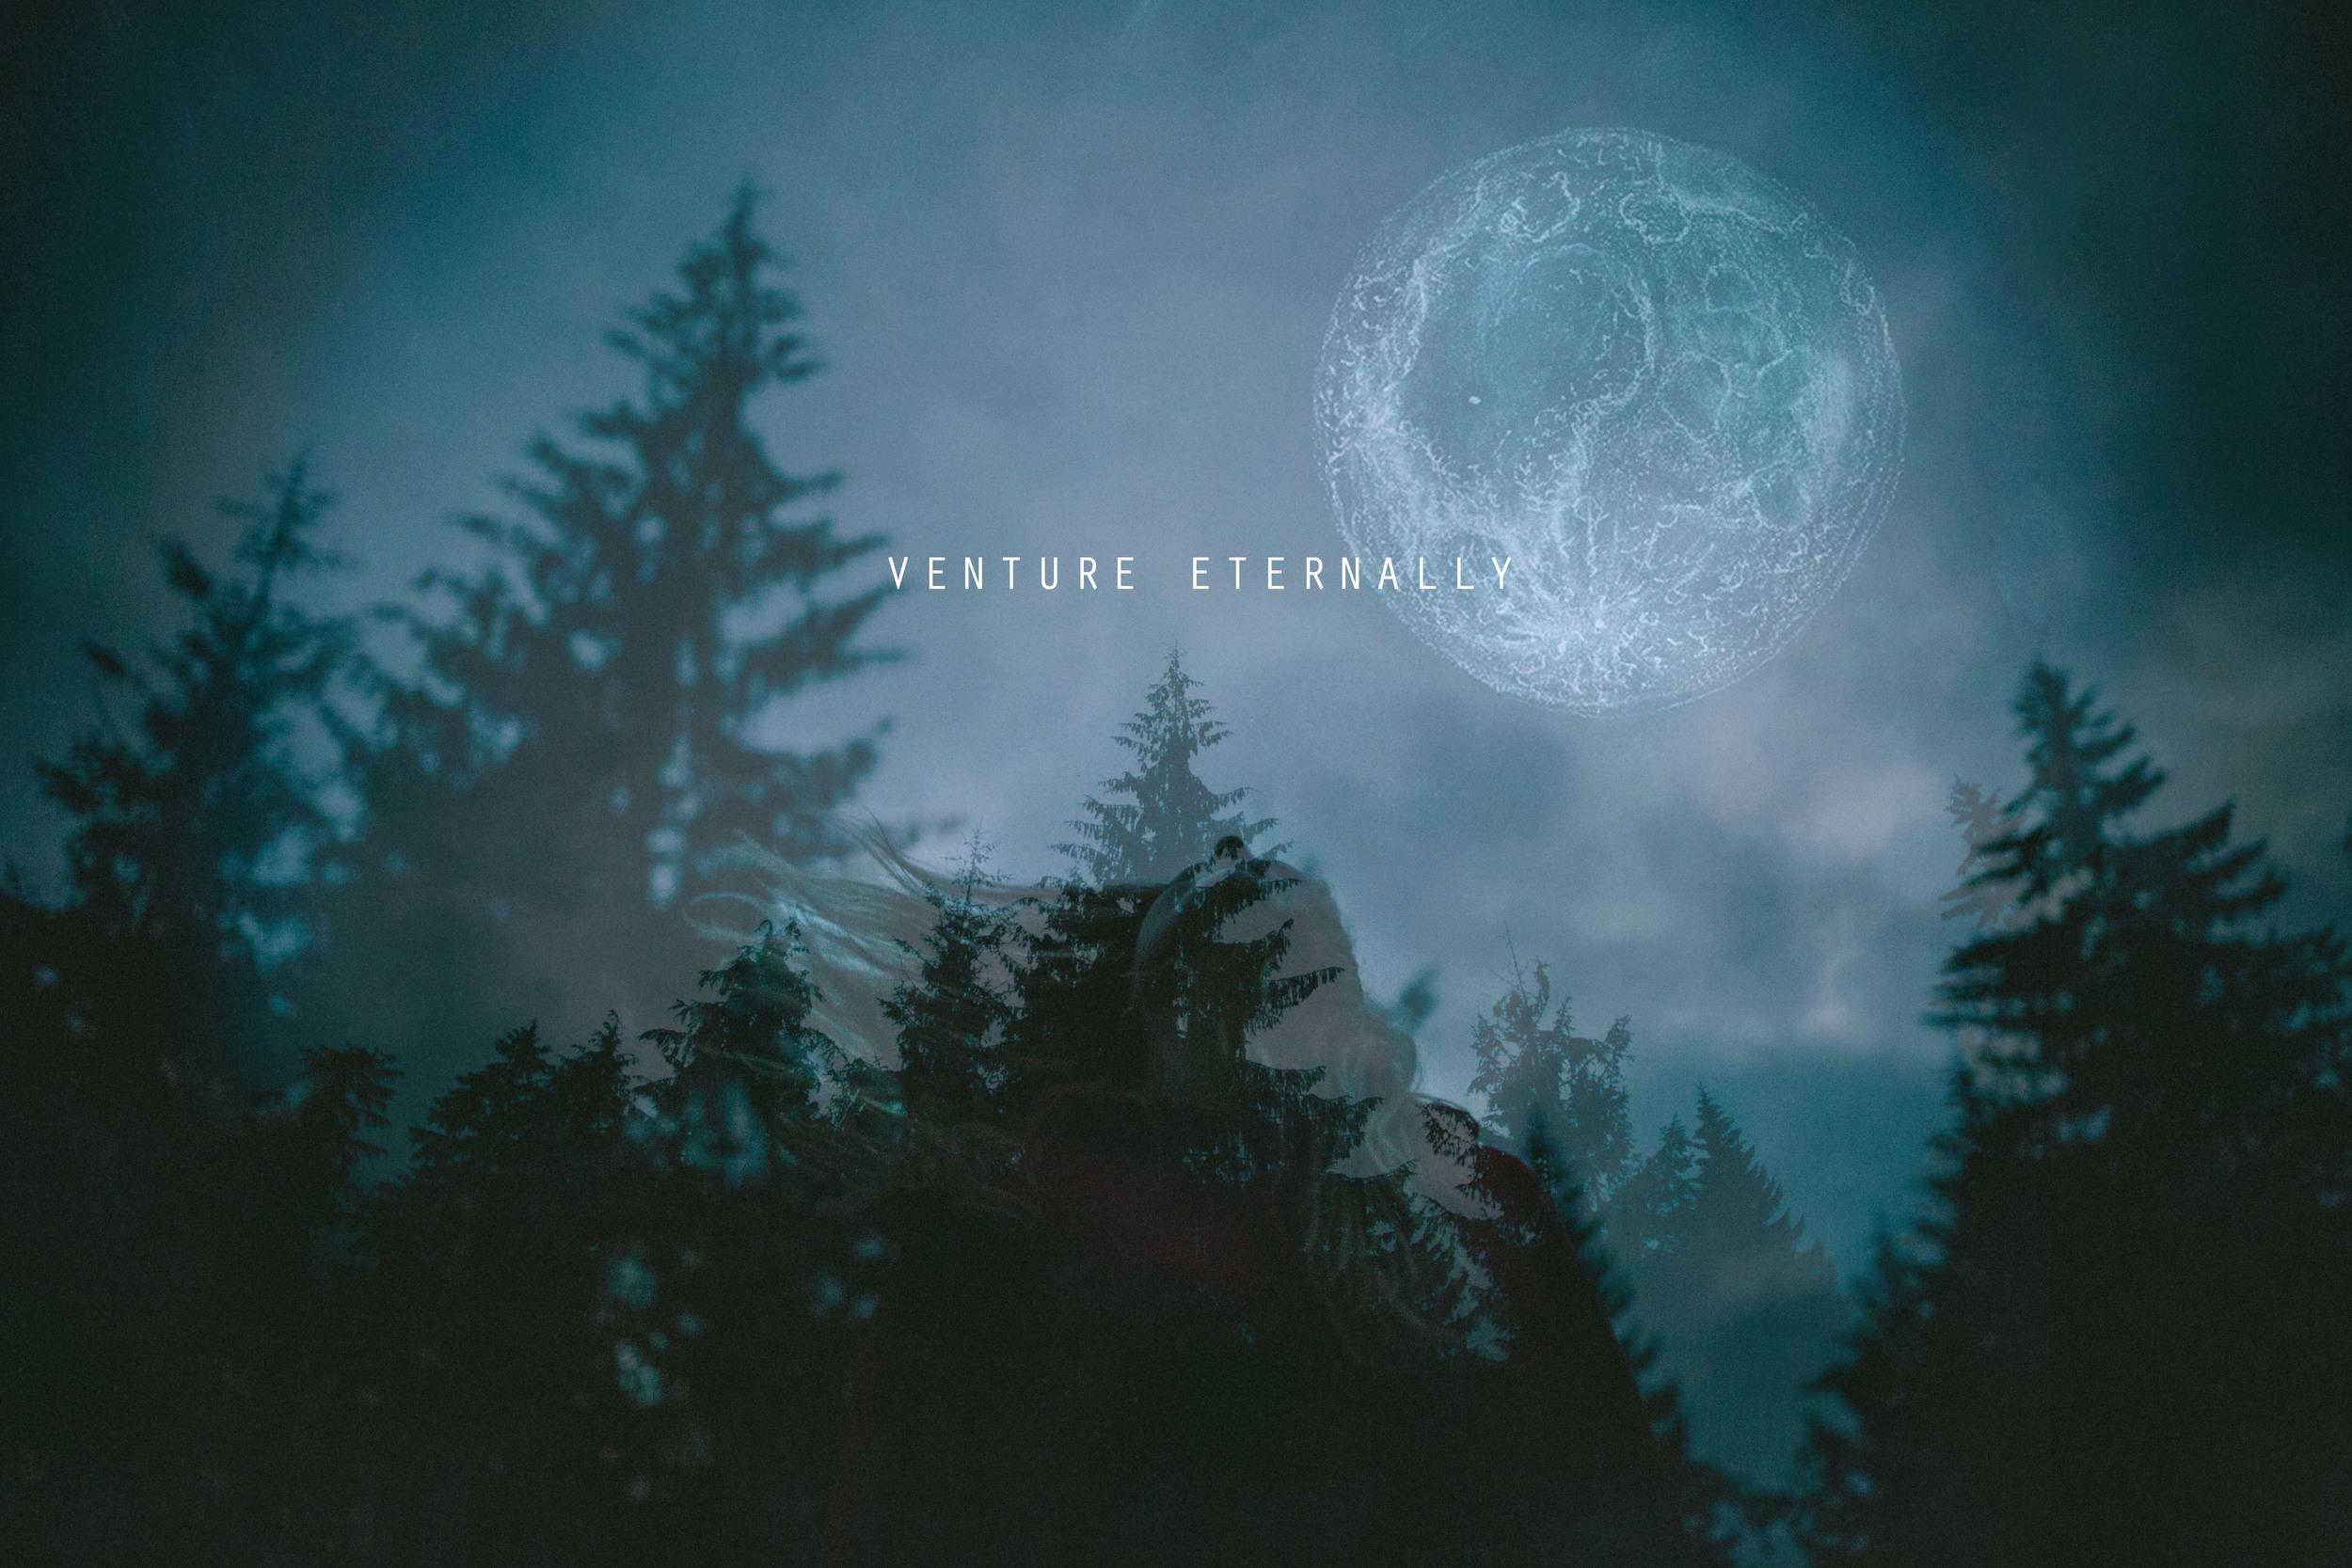 VENTURE ETERNALLY // THE ETERNAL CHILD